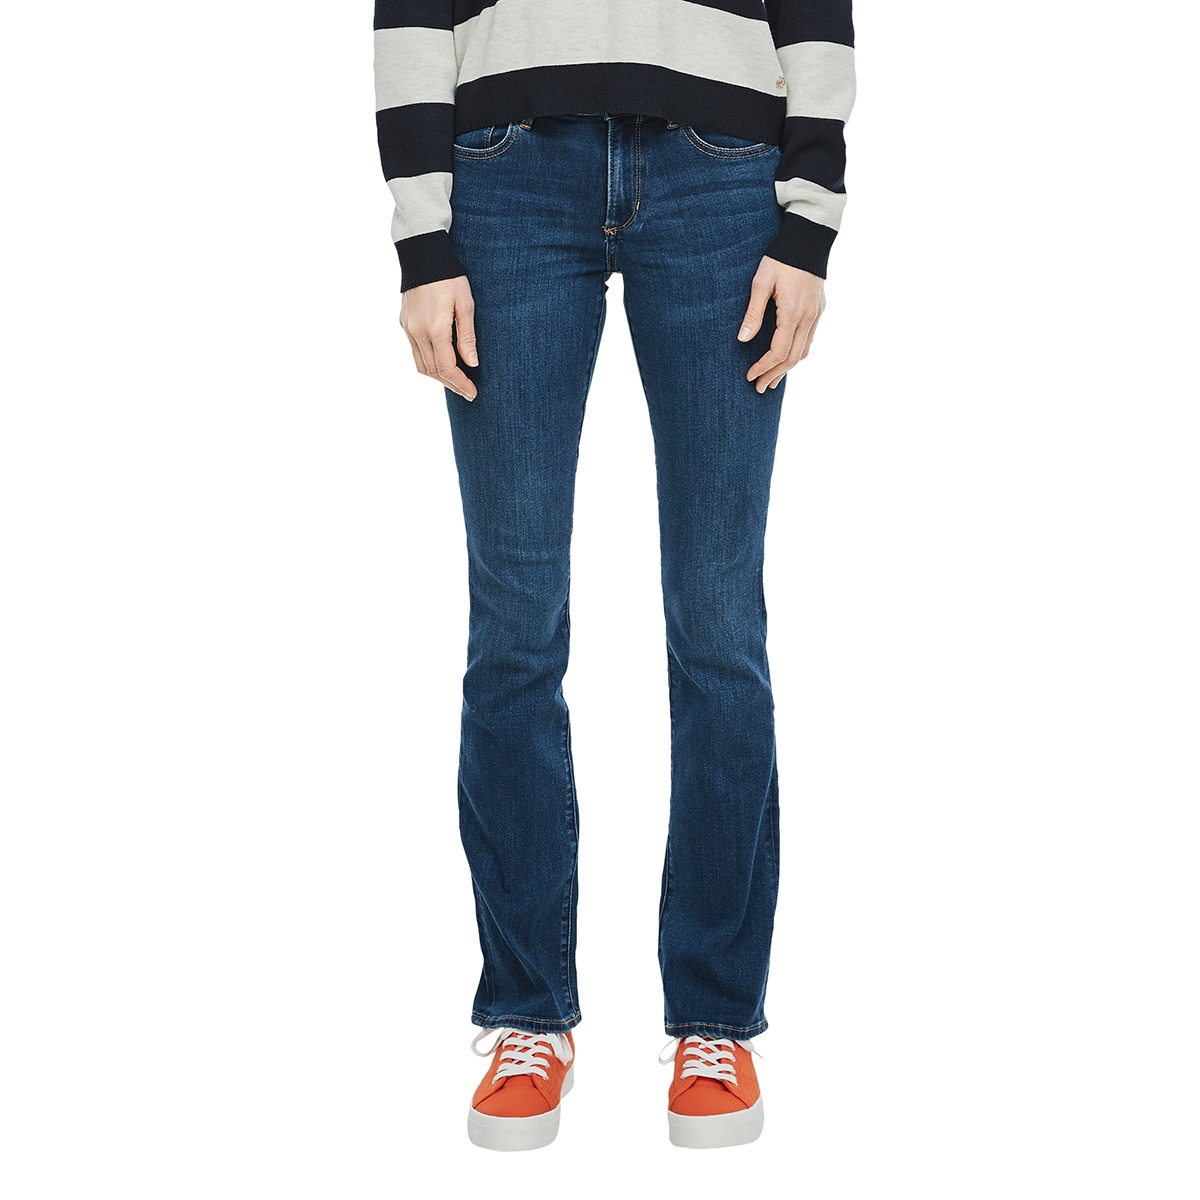 betsy 04899715977 s.oliver jeans 58z5